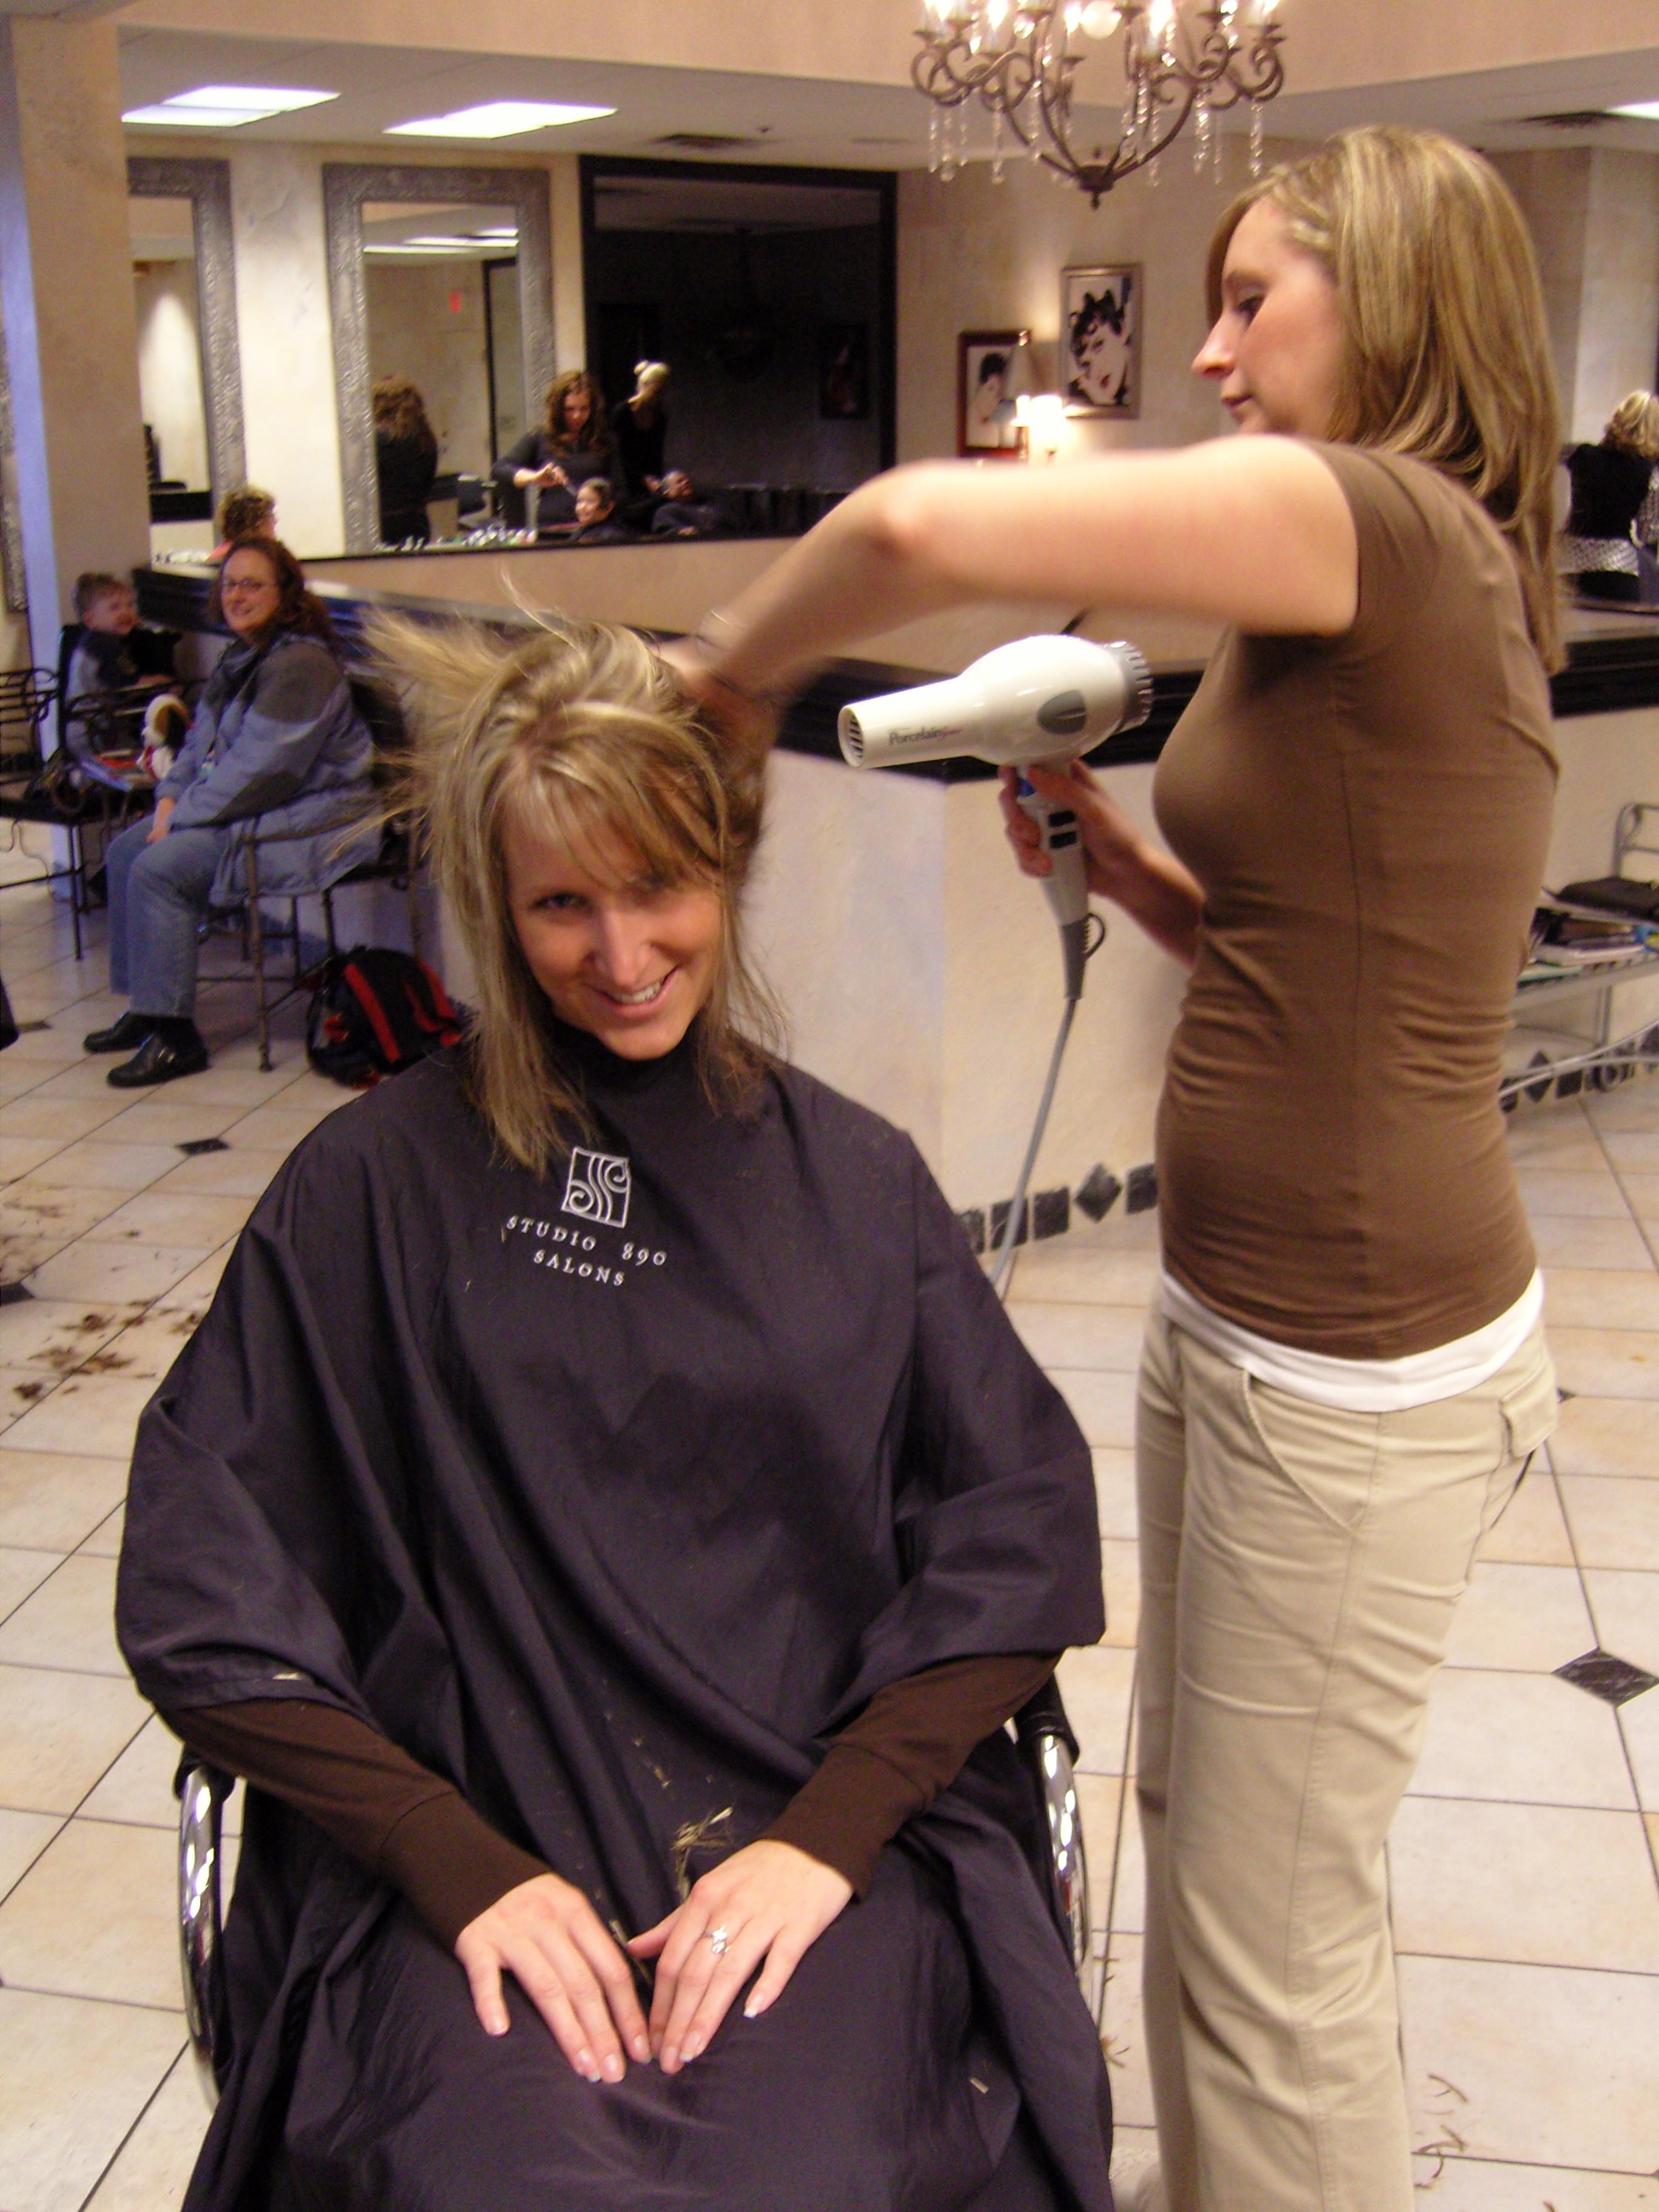 File:Drying hair in salon.jpg Alec Baldwin Wi